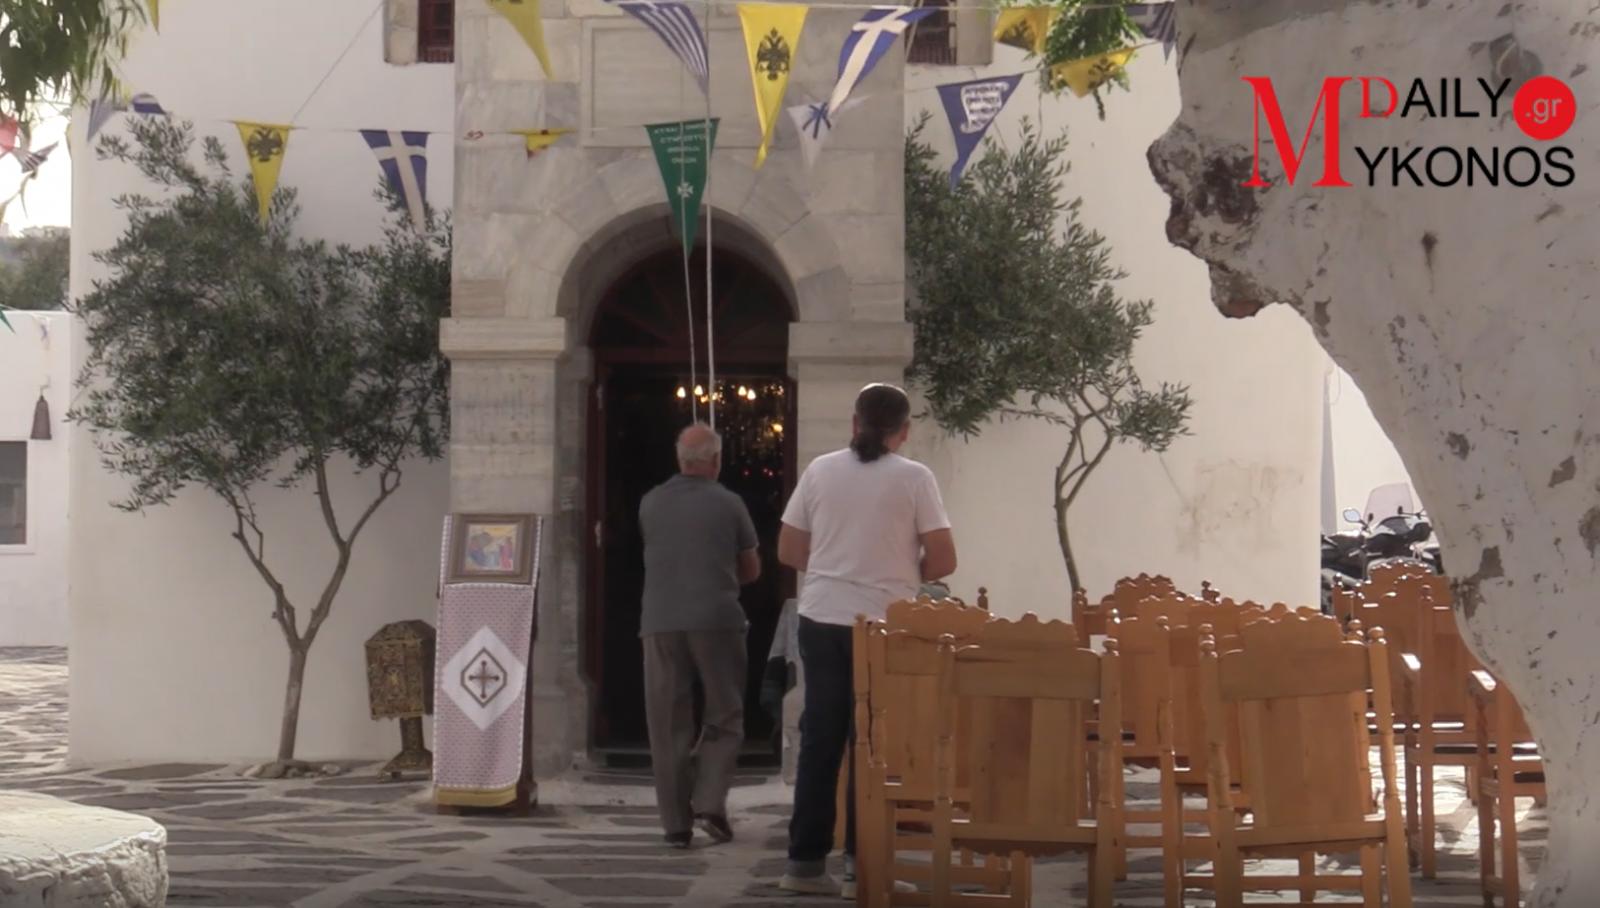 Video Report / Εκκλησίες: «Μουδιασμένοι» οι πιστοί στο πρώτο κάλεσμα